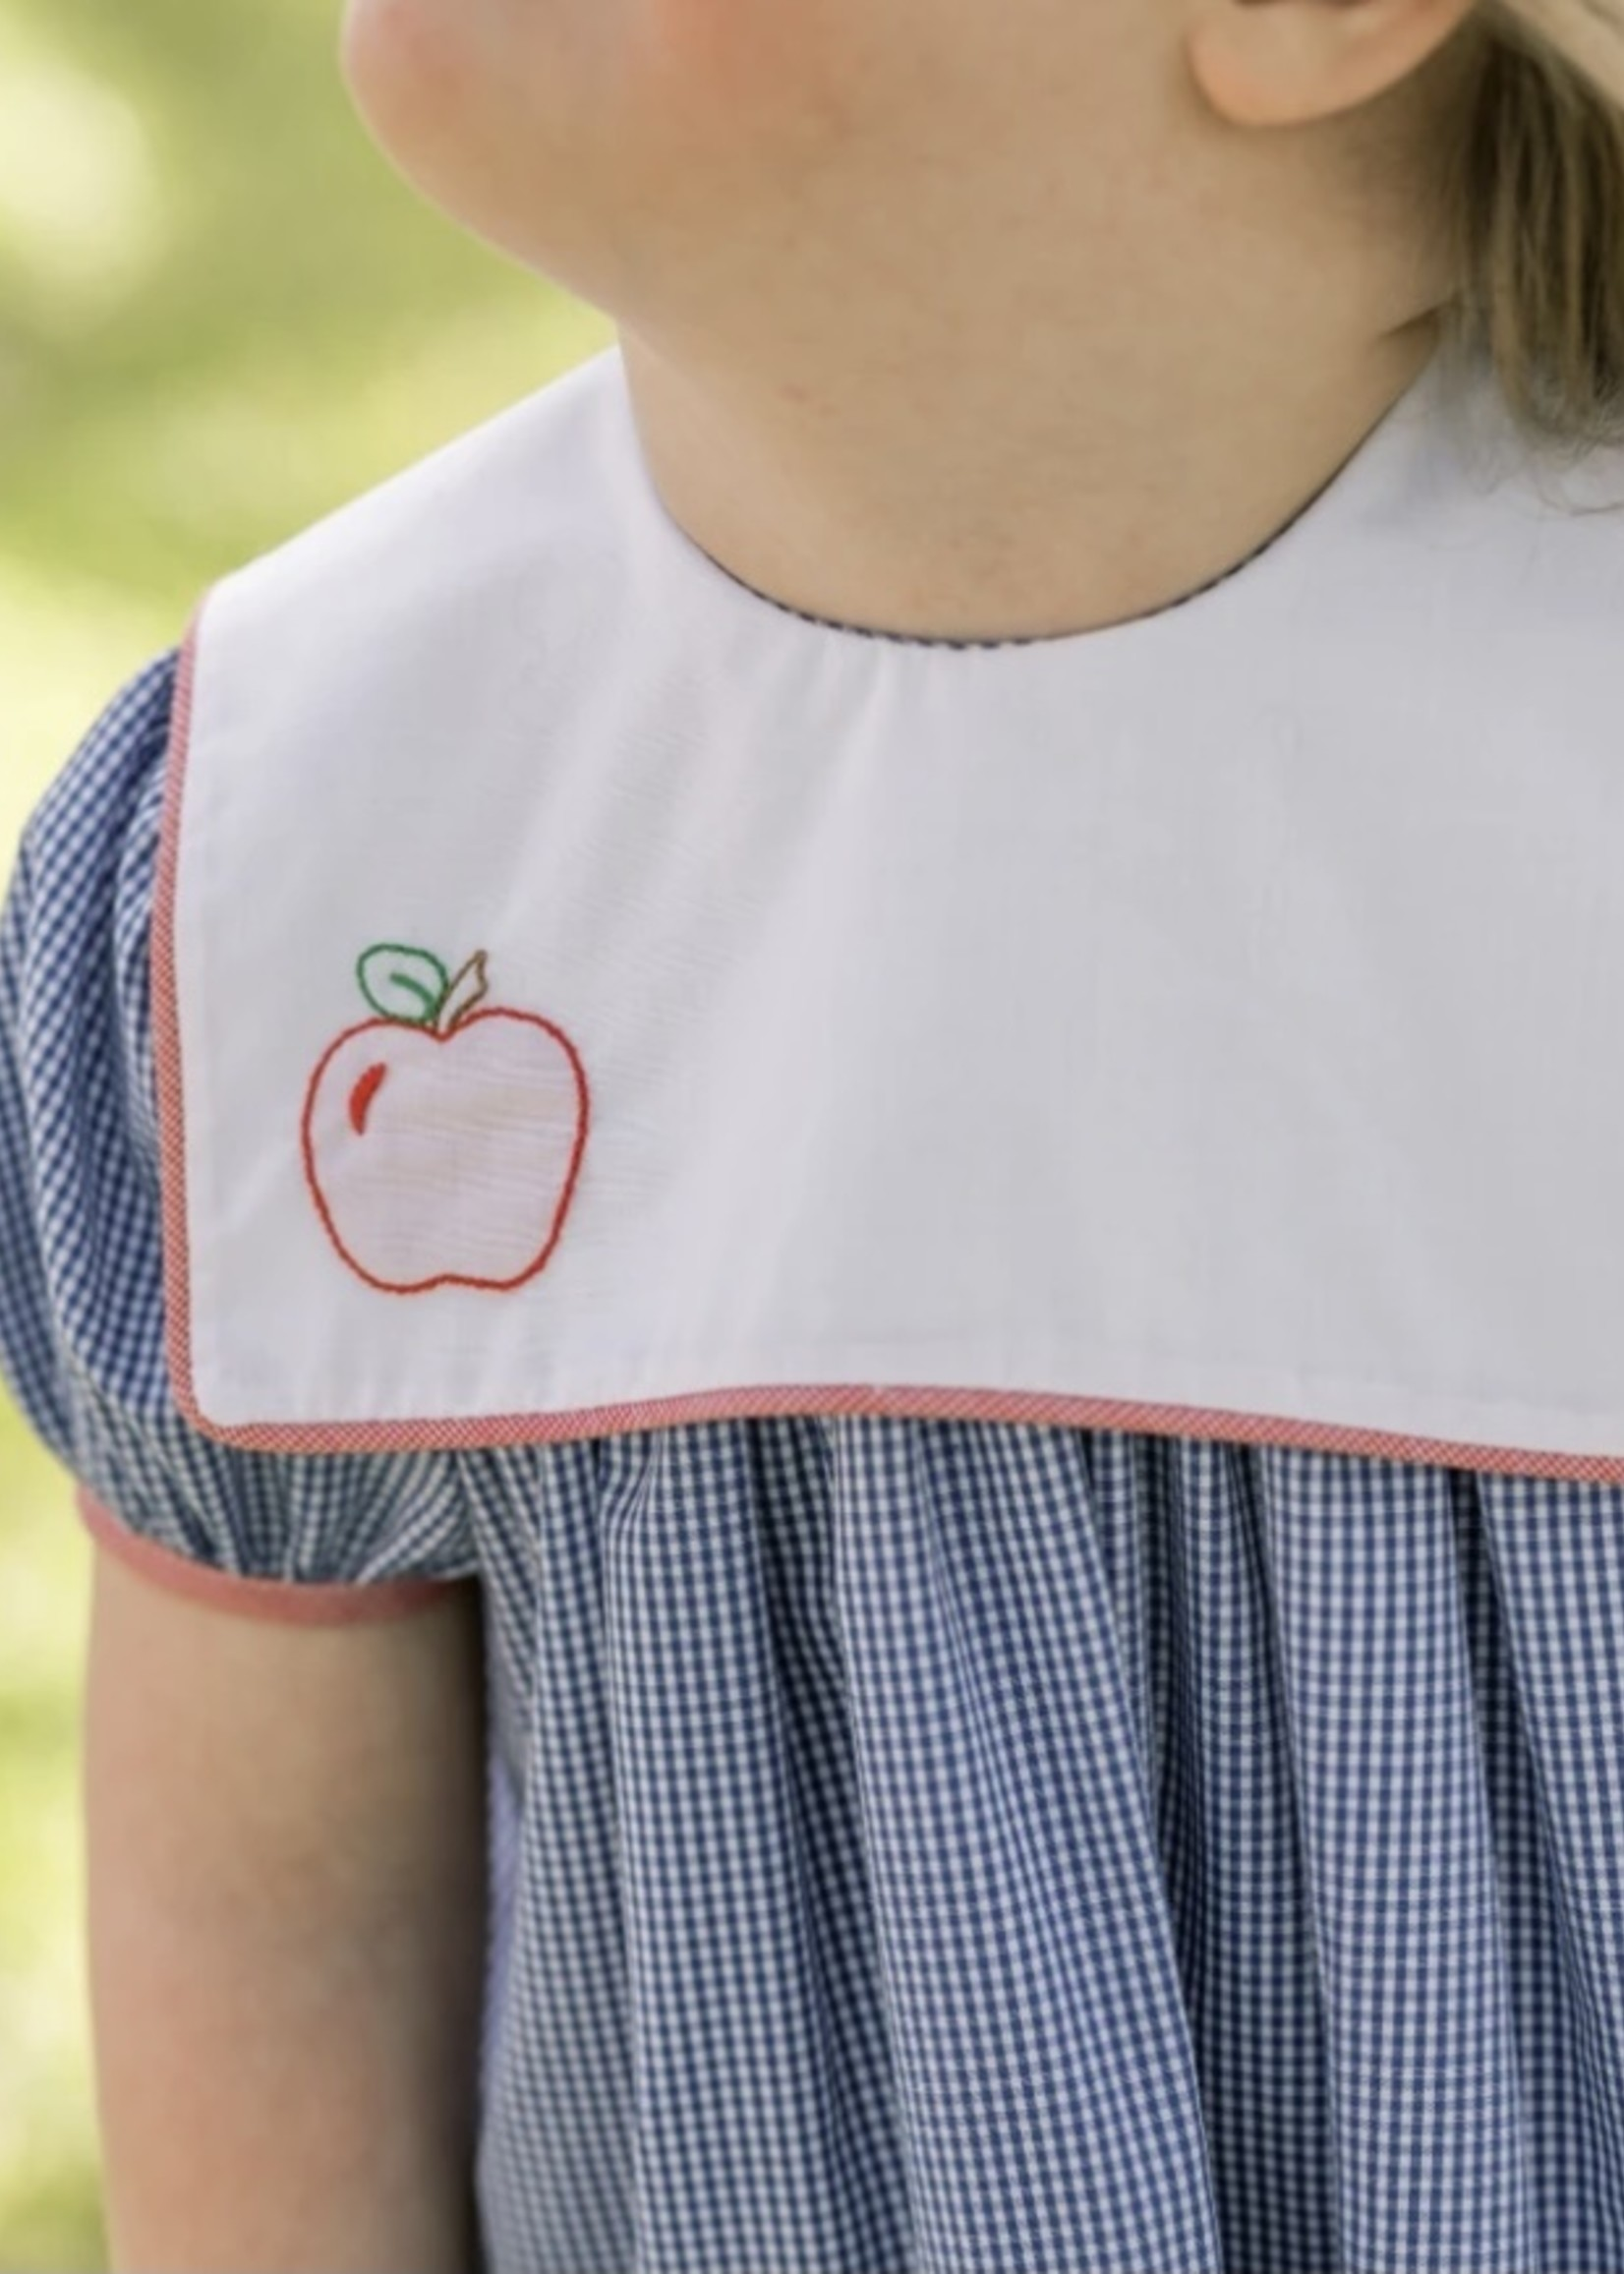 Hope Chest Dress - Royal MG - Apple Of My Eye